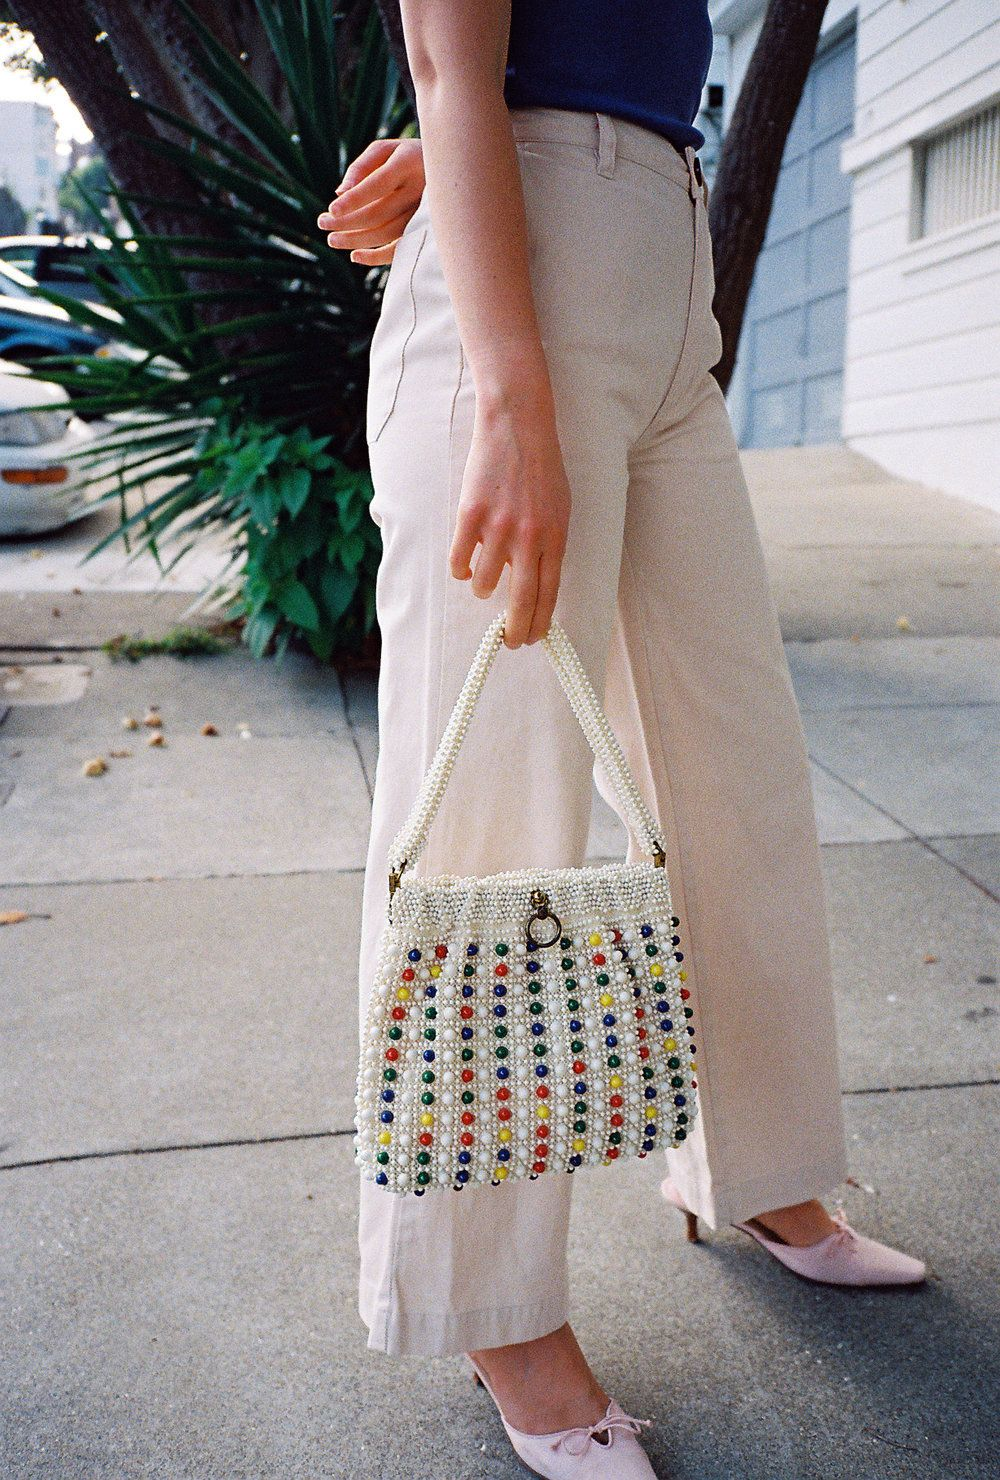 Vintage | Beaded Bag | Summer handbags, Fashion handbags